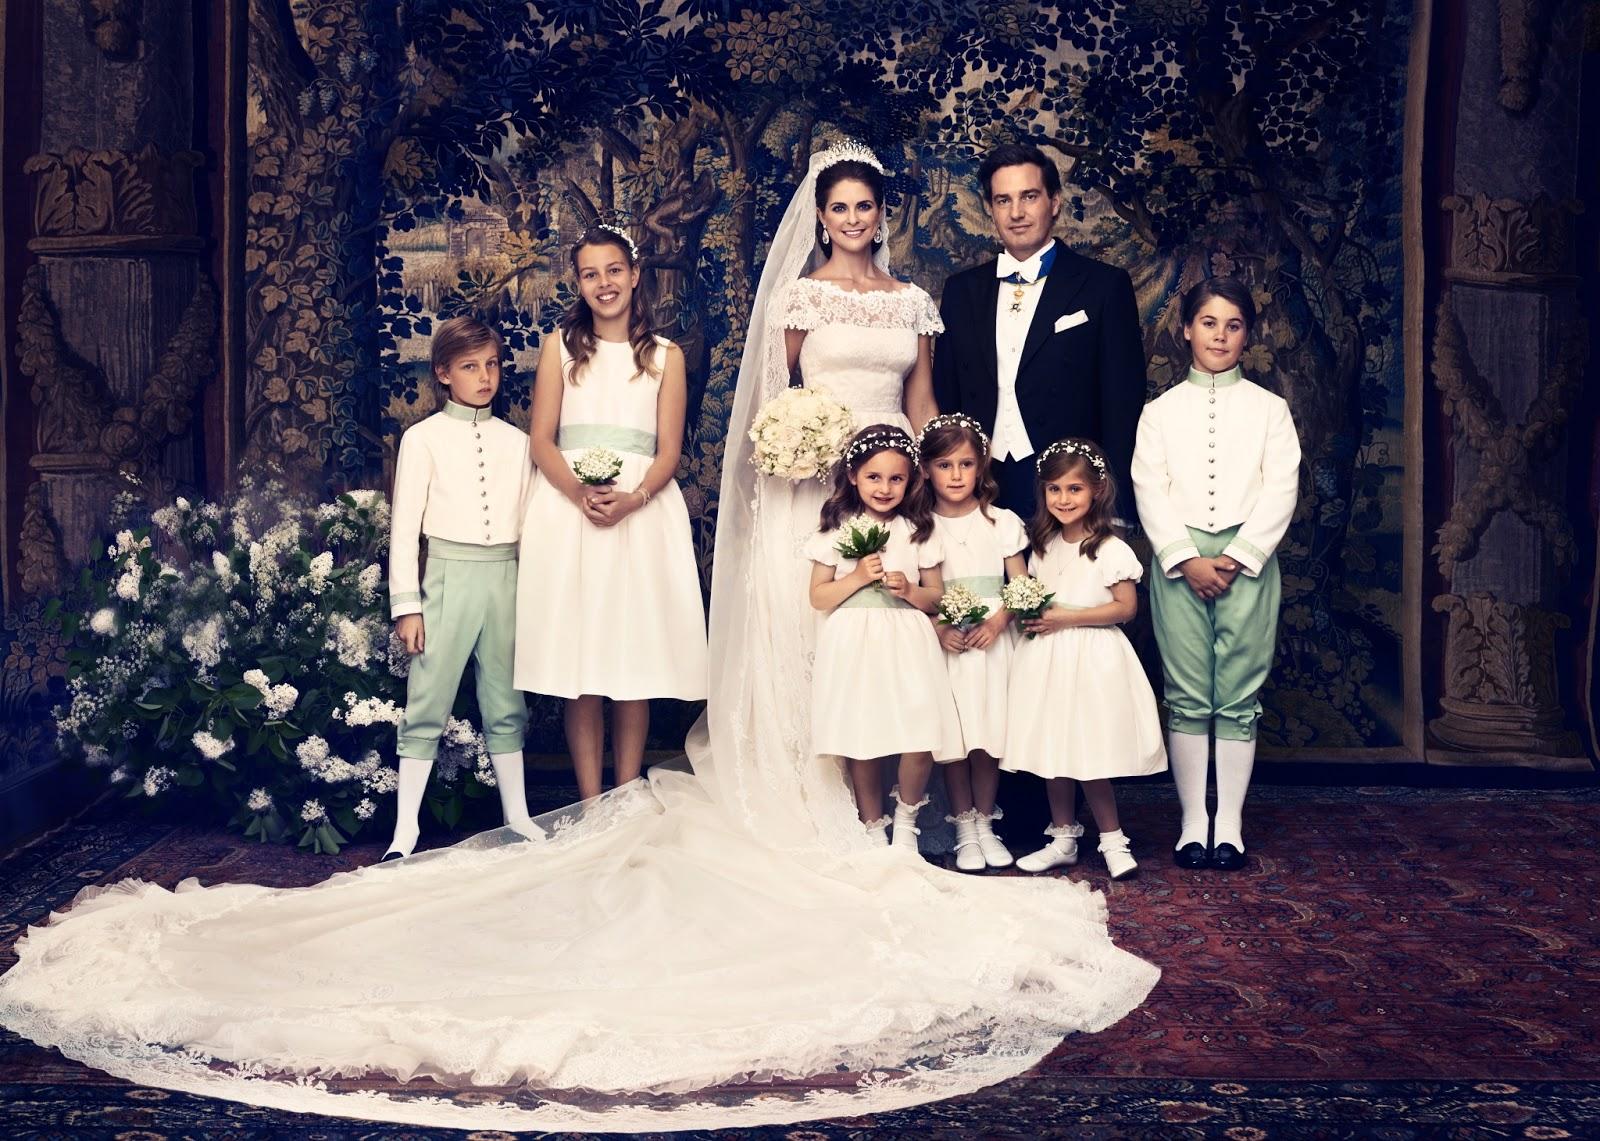 be40320eac6f Prinsessbröllopet: de officiella bilderna!